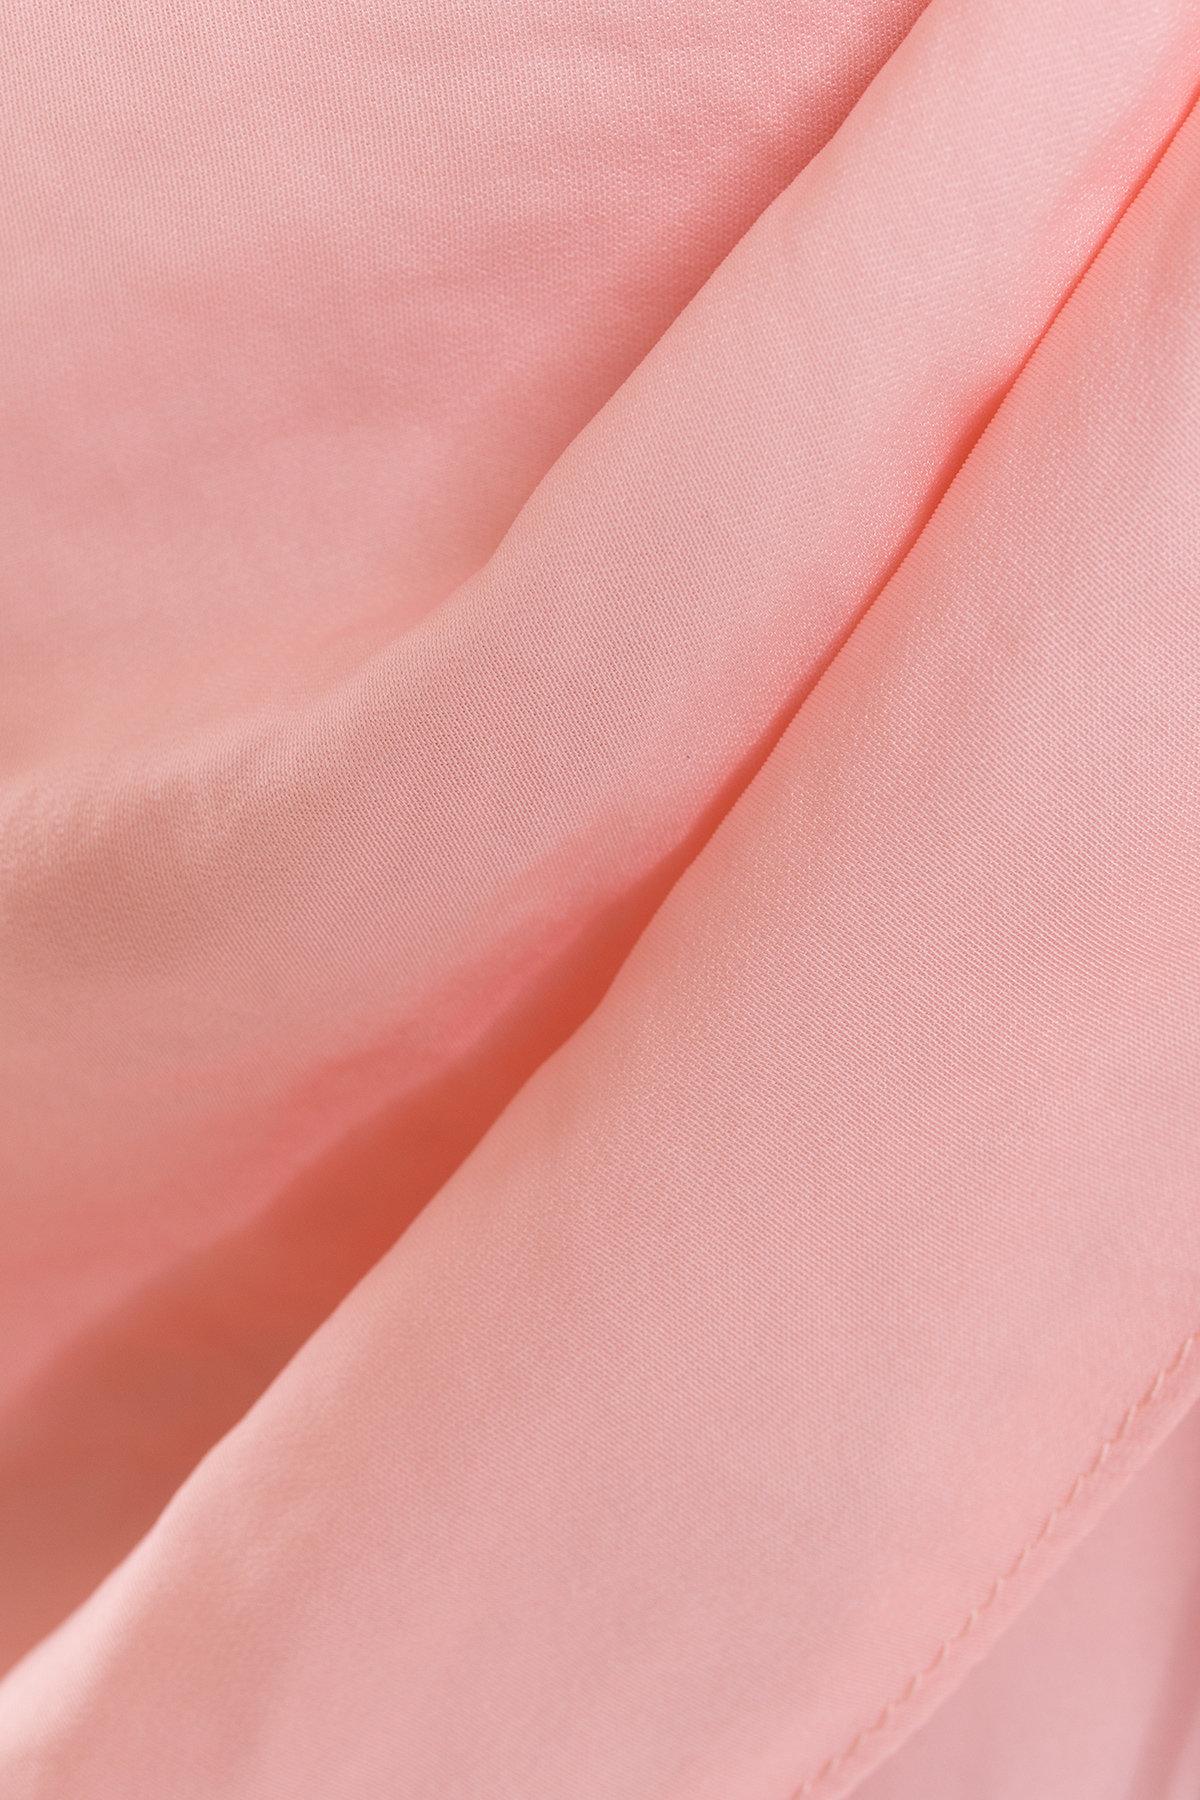 Комбинезон Наоми 3125   Цвет: Персик